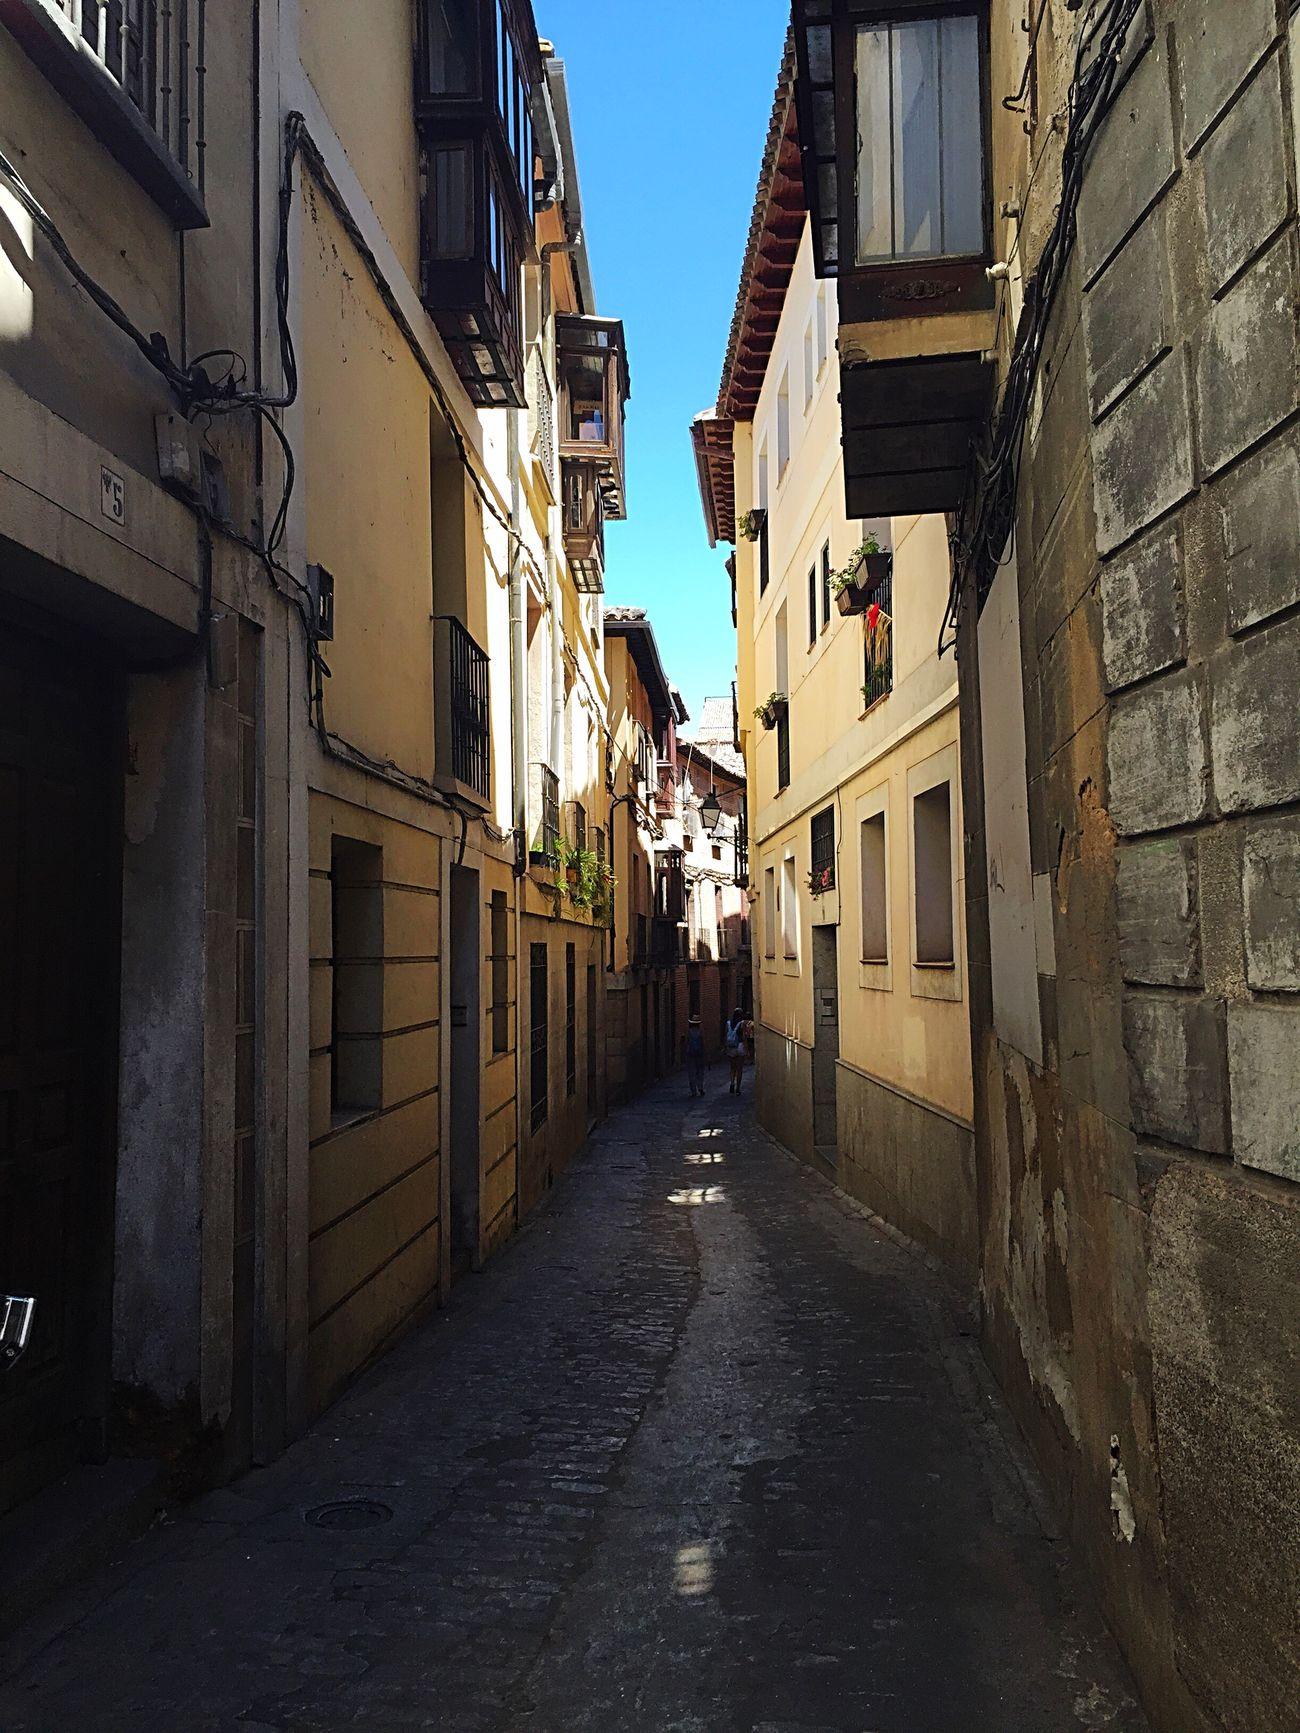 The Street Photographer - 2017 EyeEm Awards Toledo Spain SPAIN La Mancha Alfileritos Alley Callejón